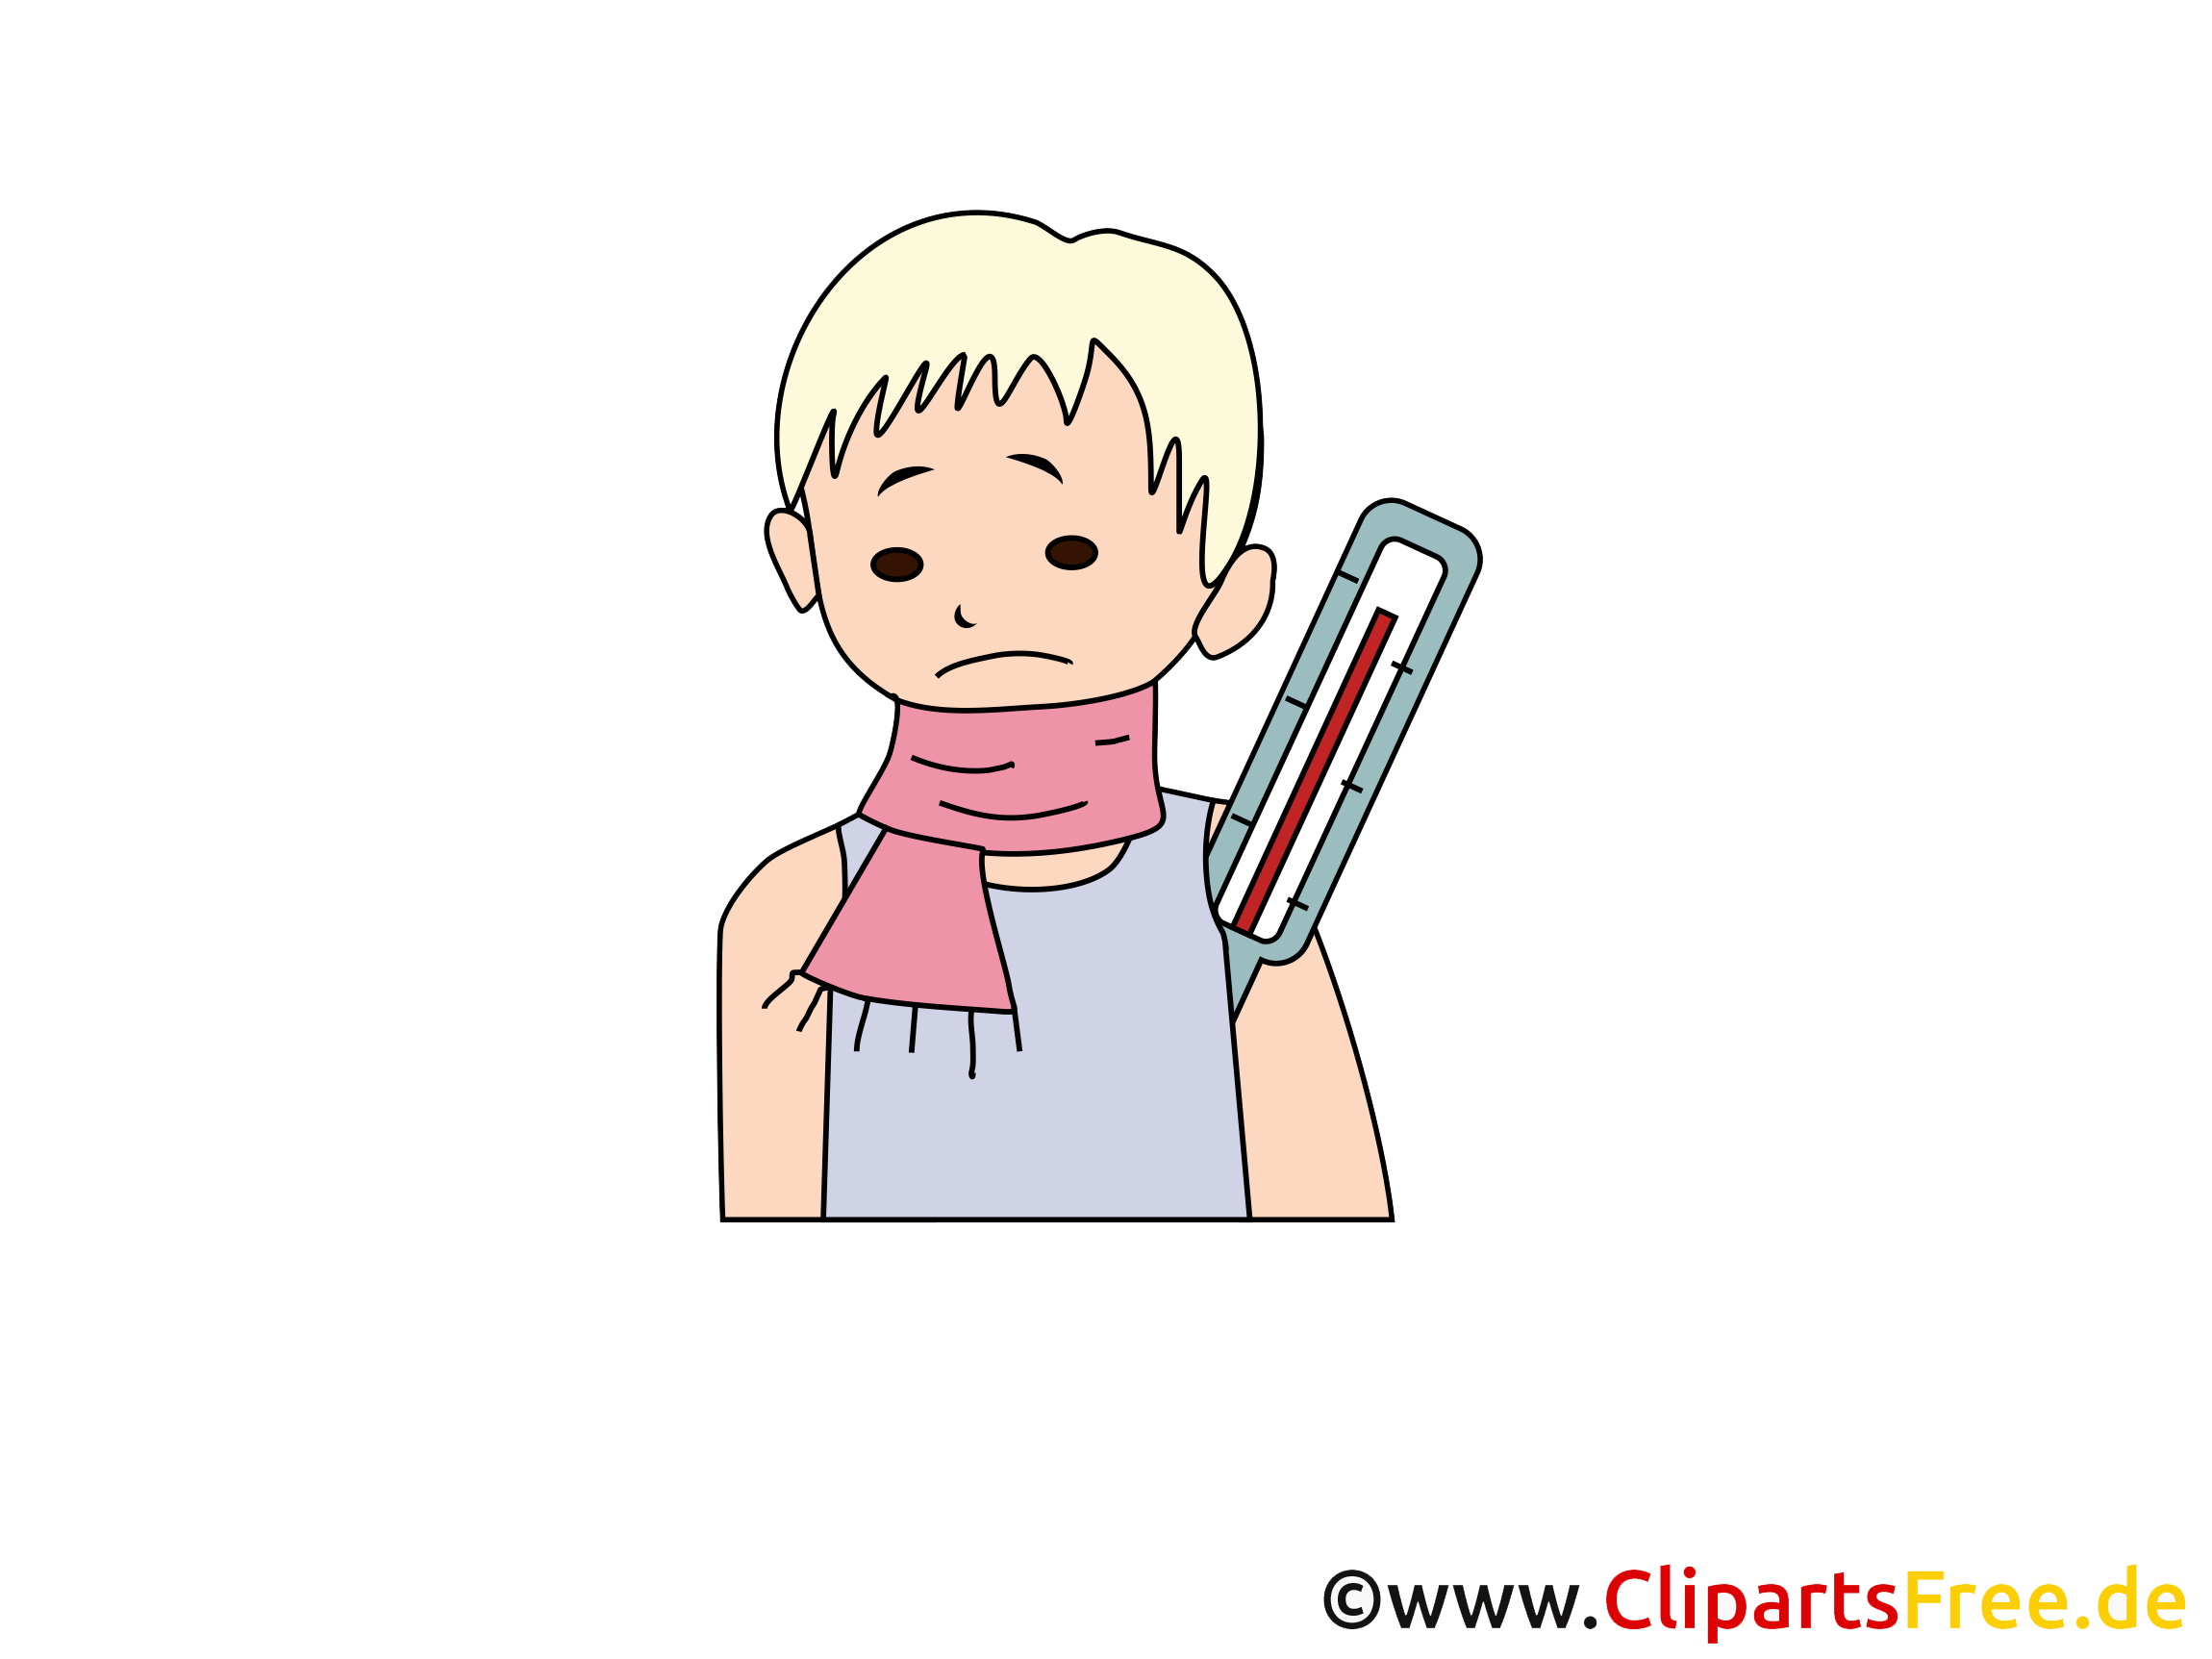 Krank Fieber Clipart Bild Medizin